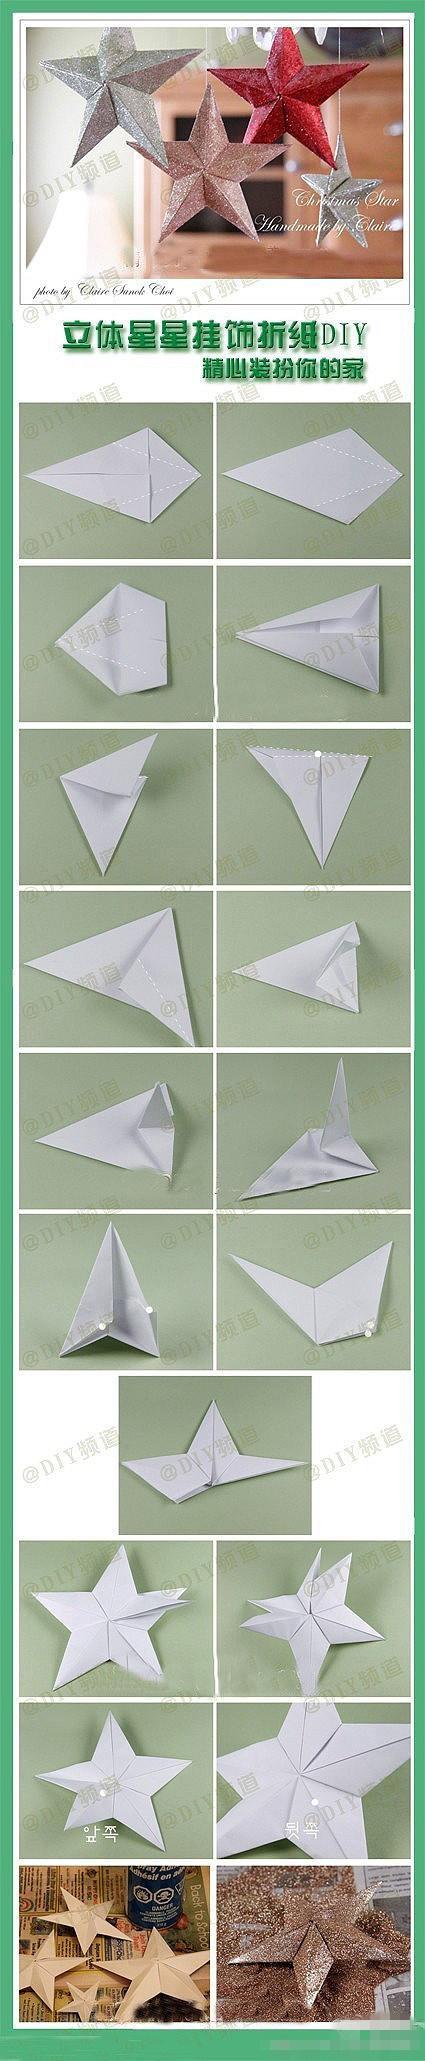 teach u how to make 3D starts